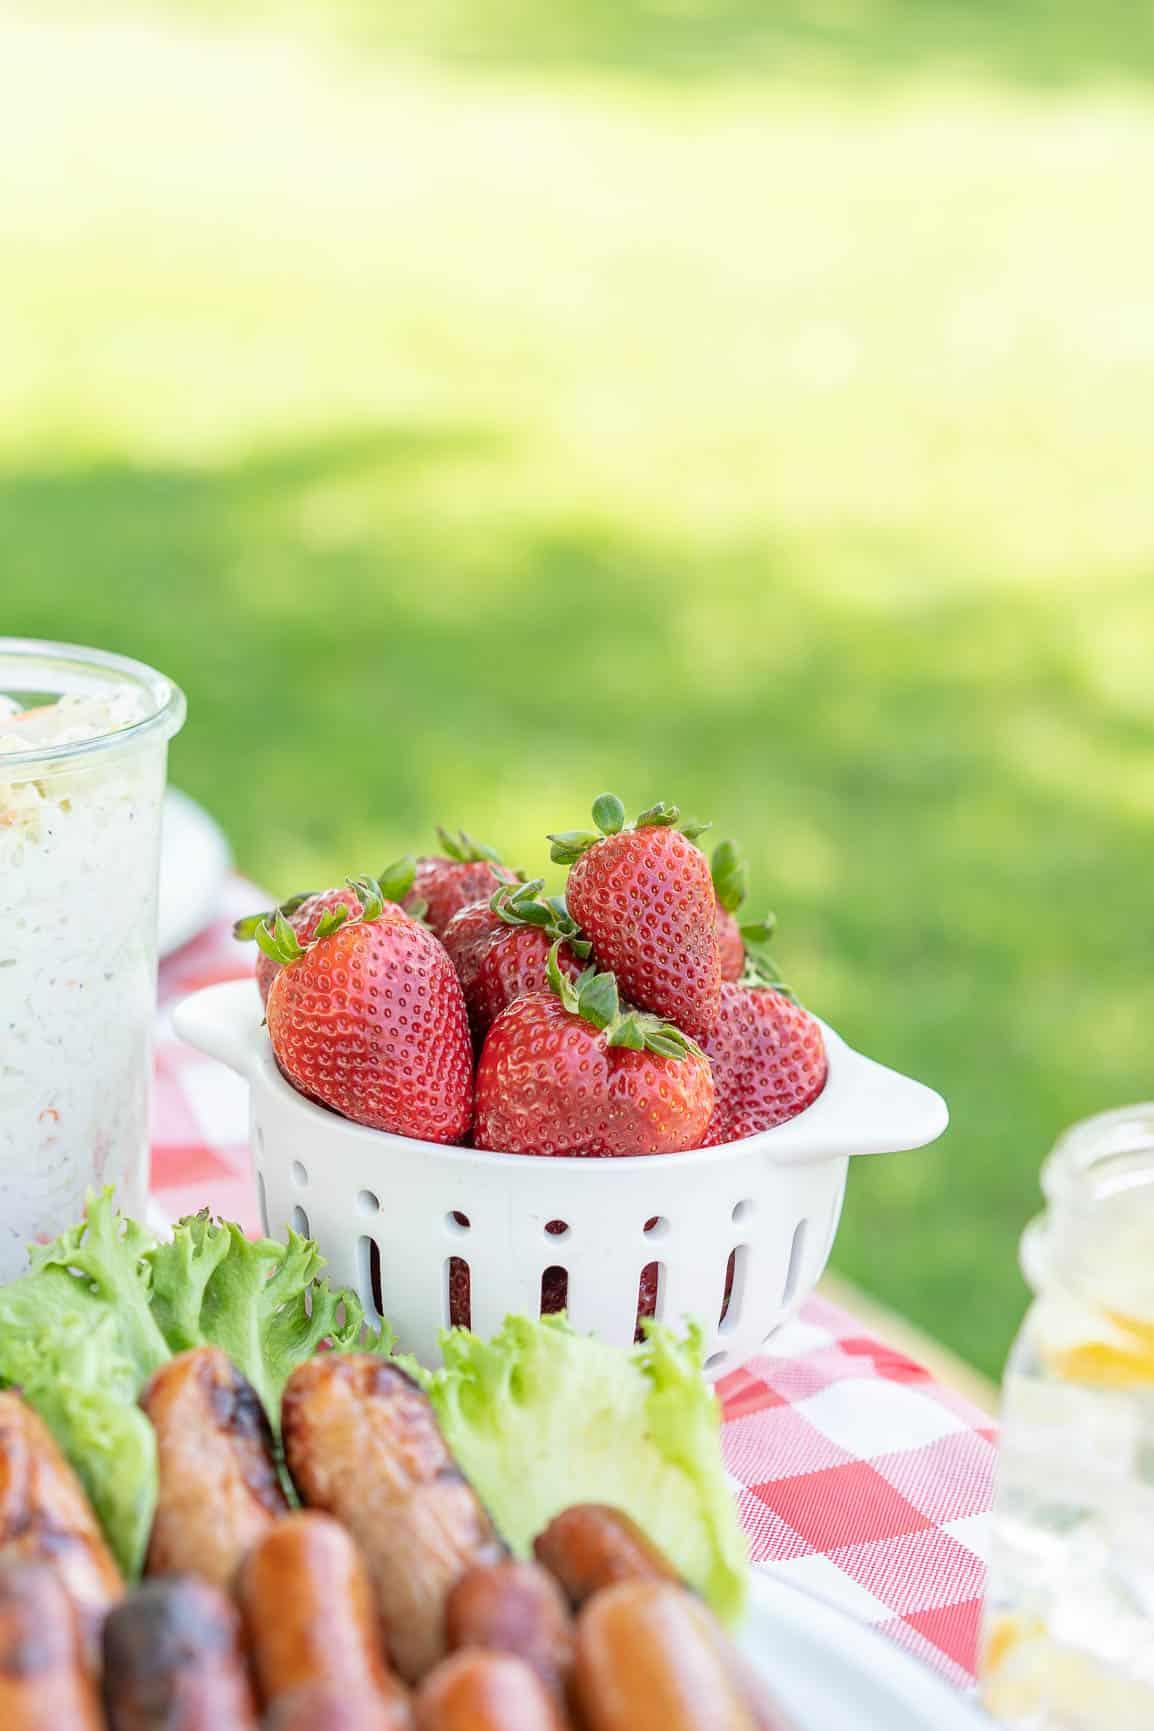 decorative colander of fresh strawberries.